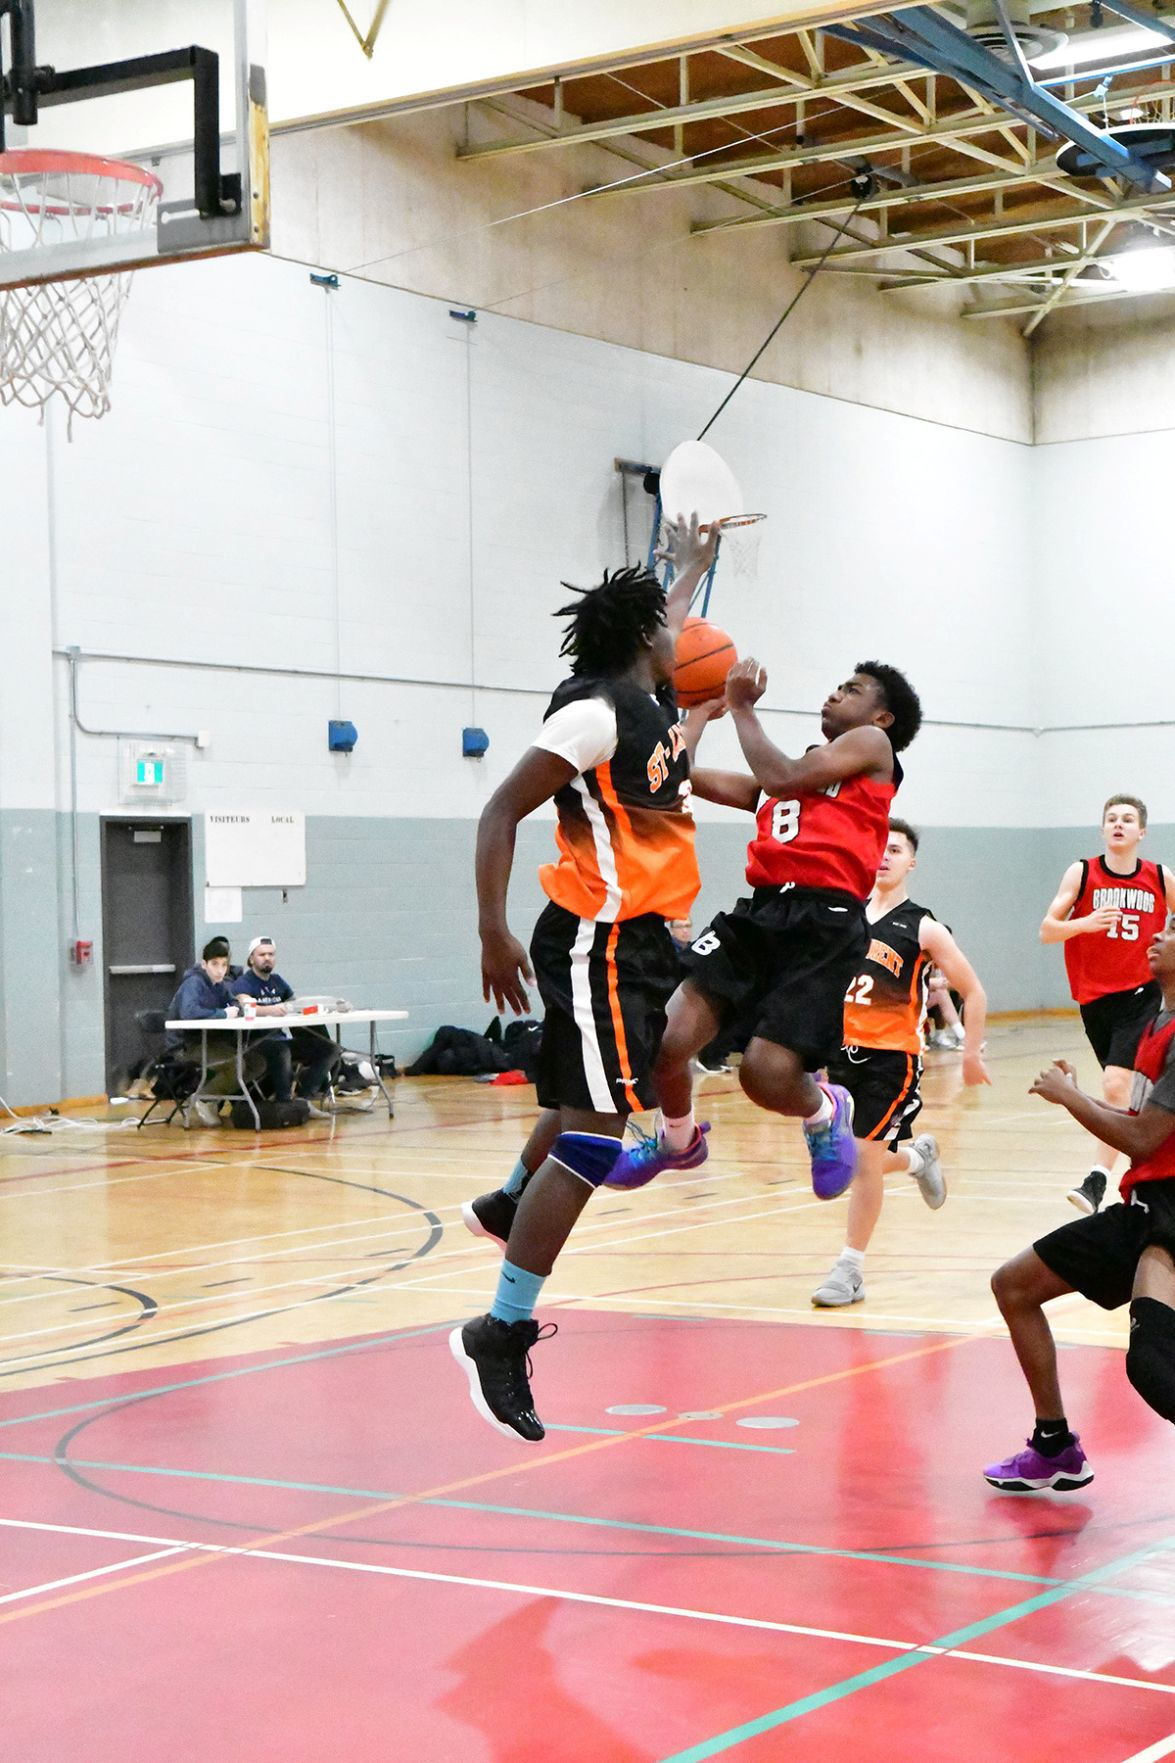 Brookwood bests Lynx in juvenile AA play